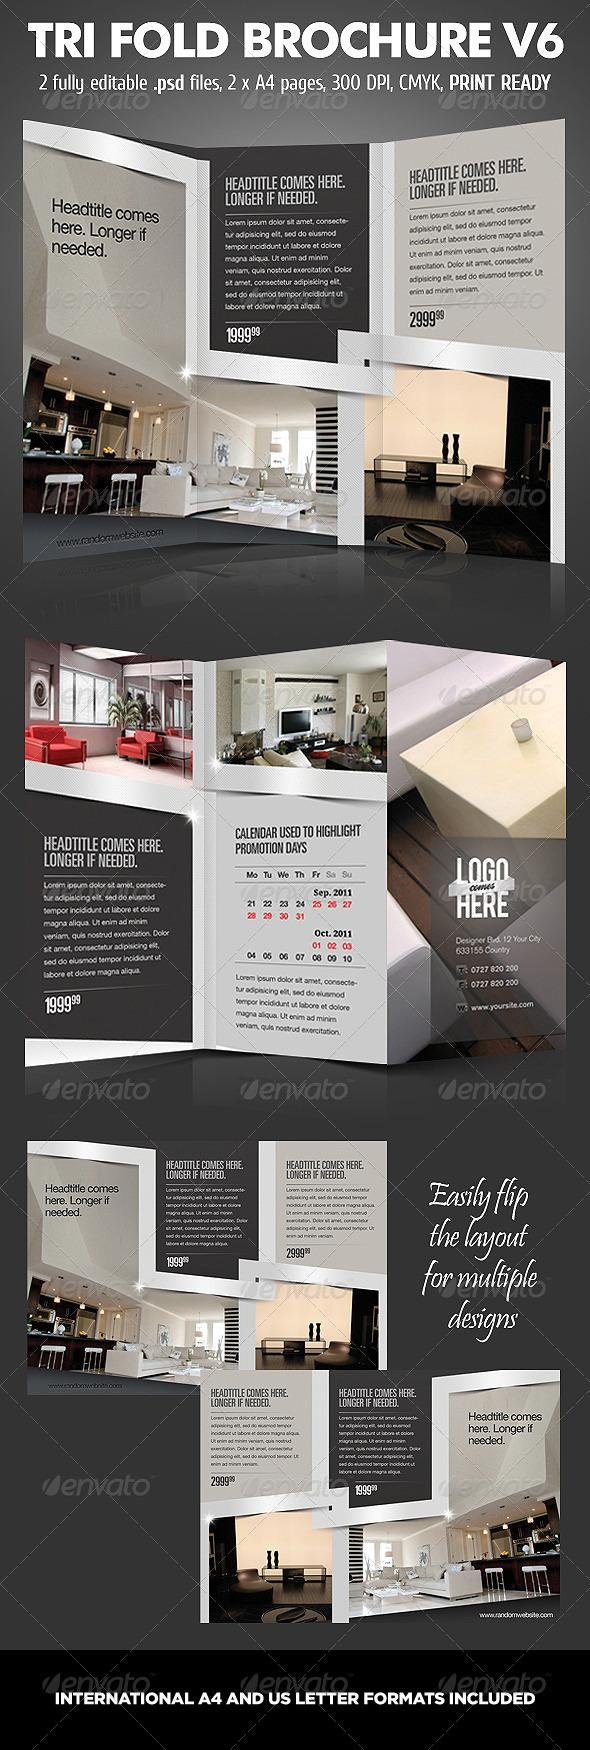 GraphicRiver TriFold Brochure V6 760186